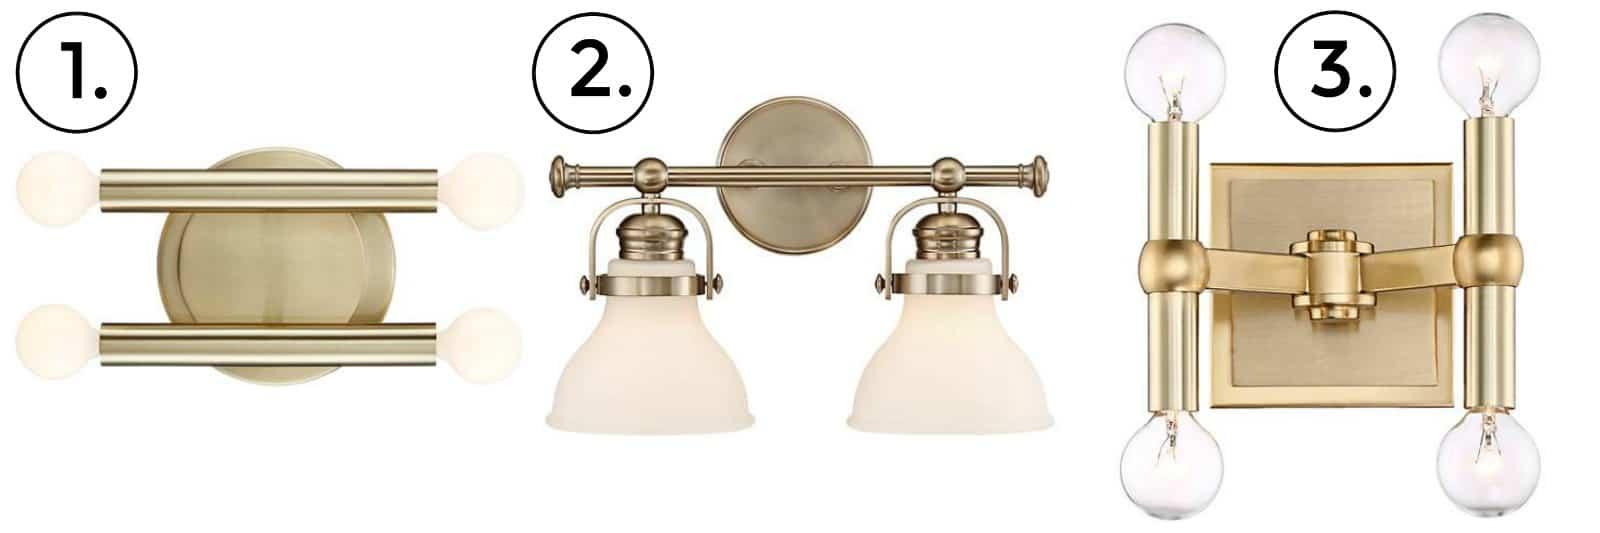 bathroom lamp options